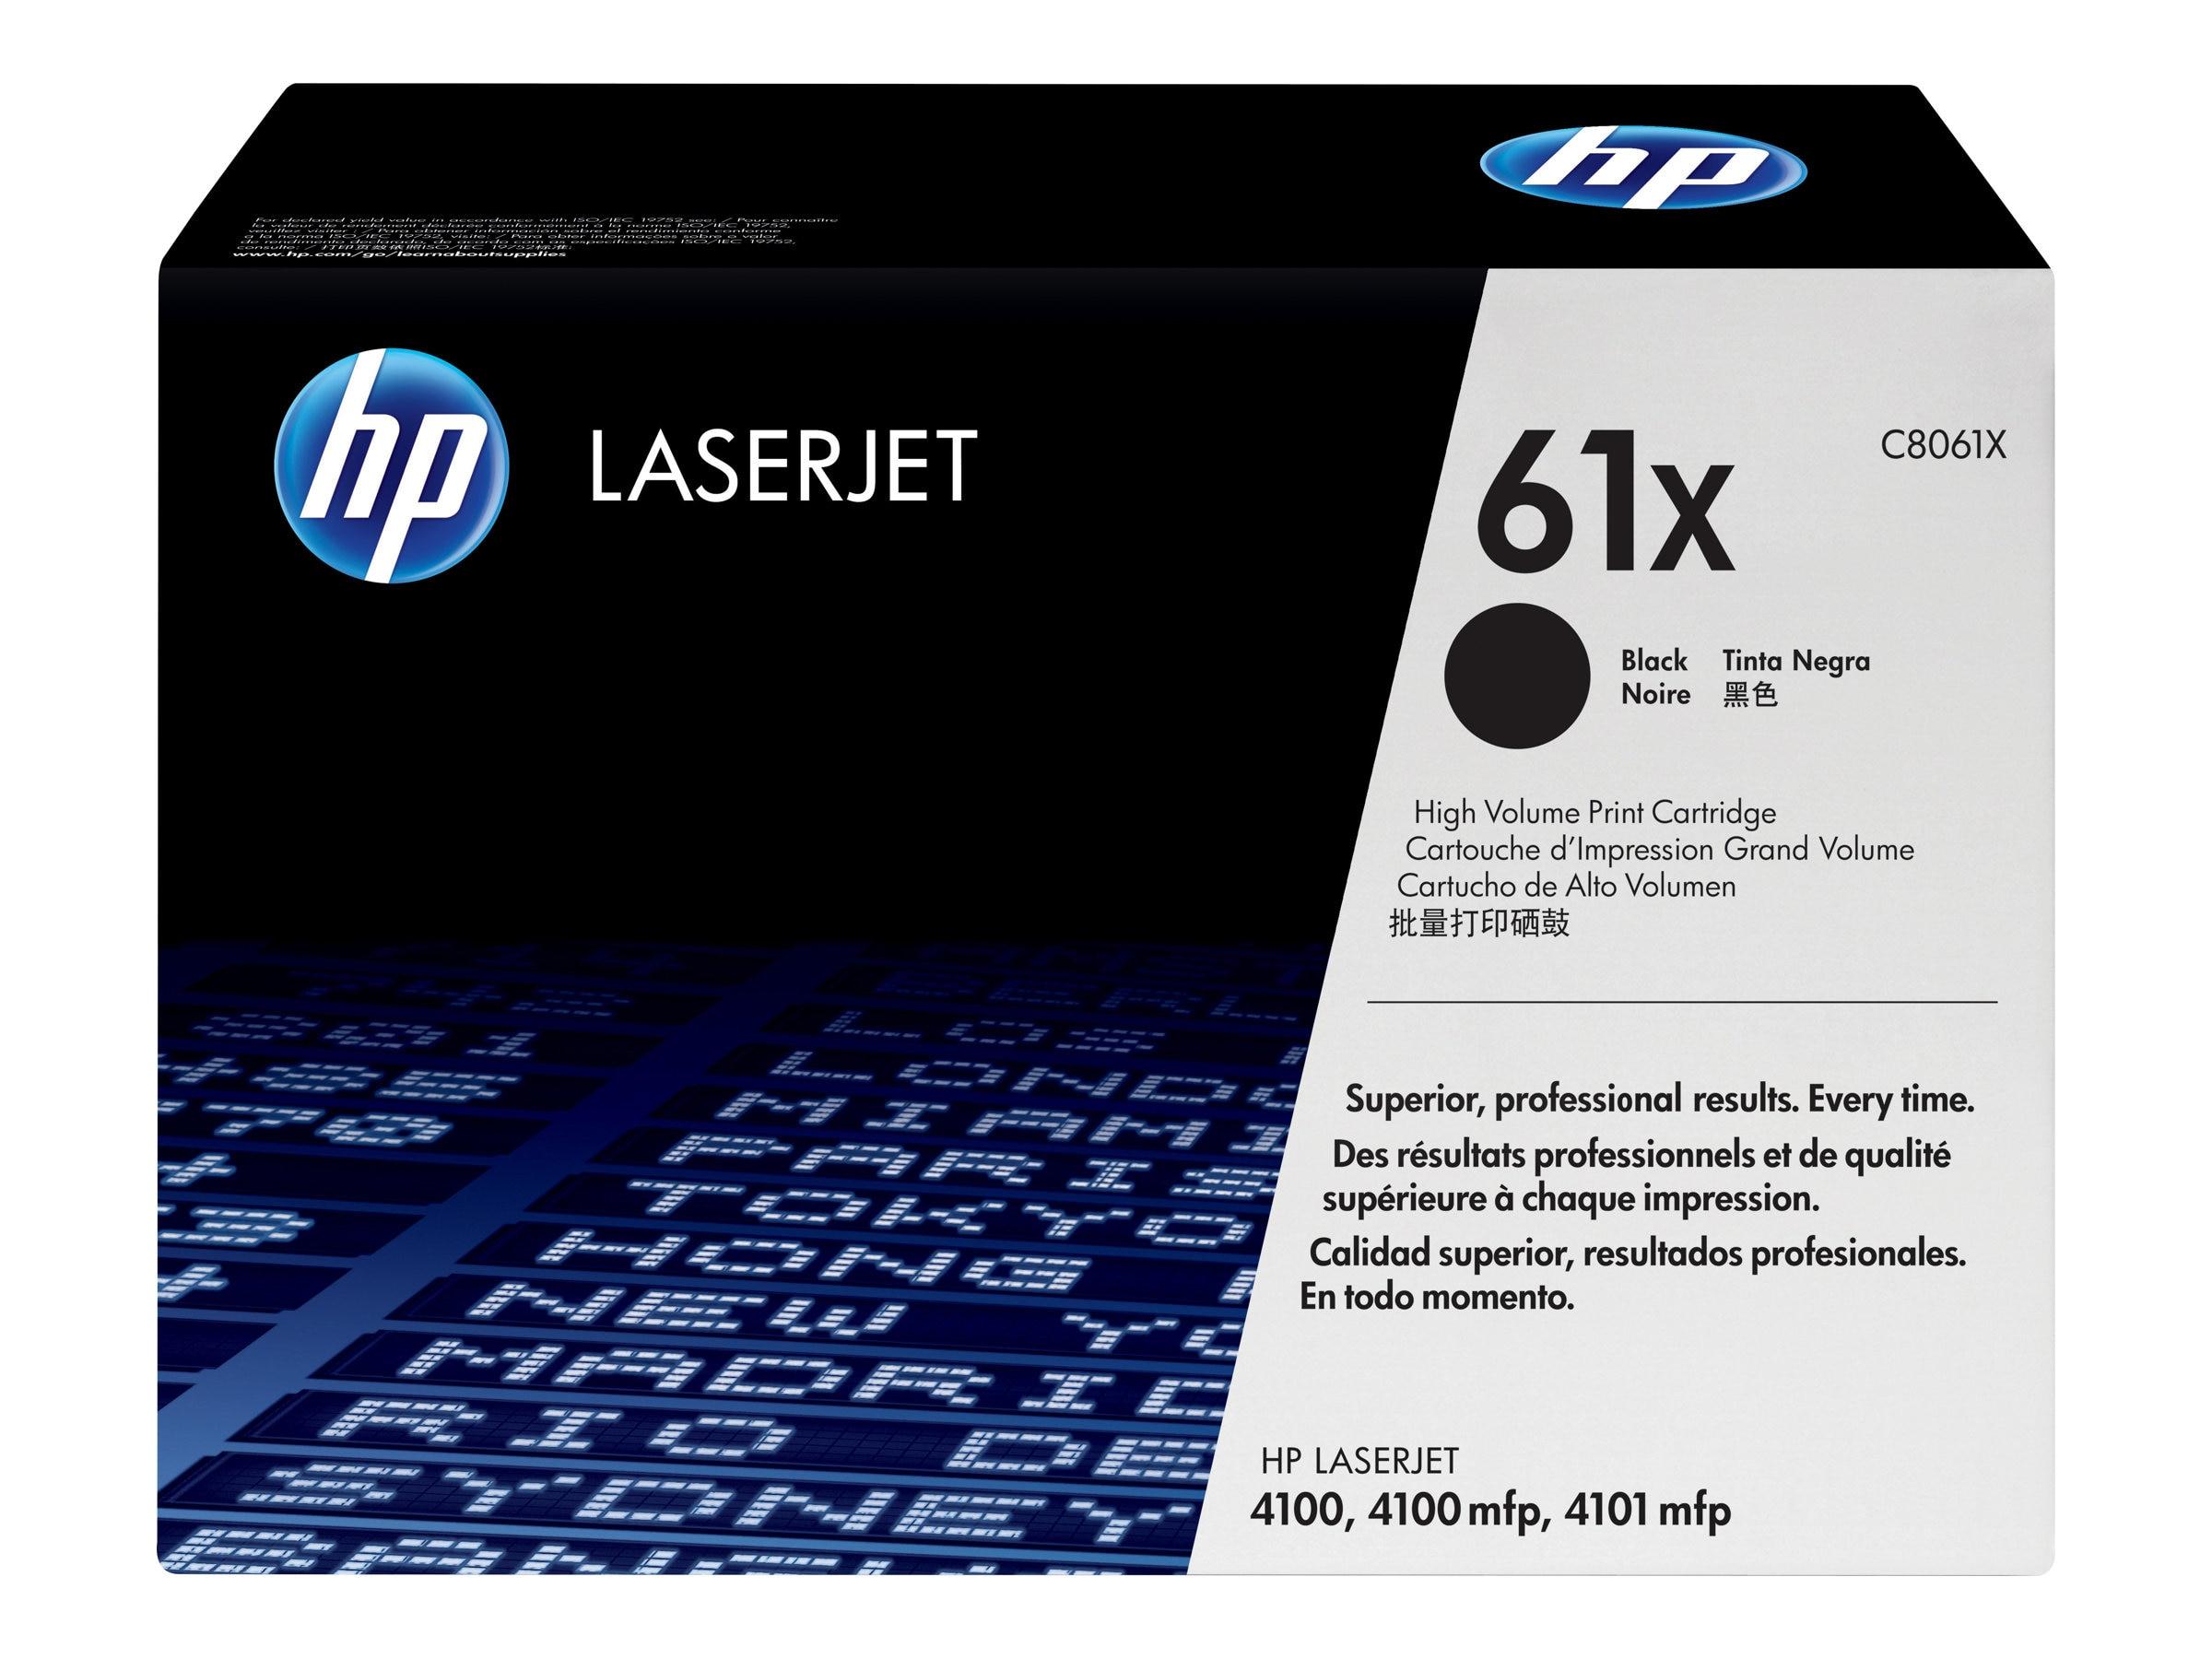 HP Inc. C8061X Image 1